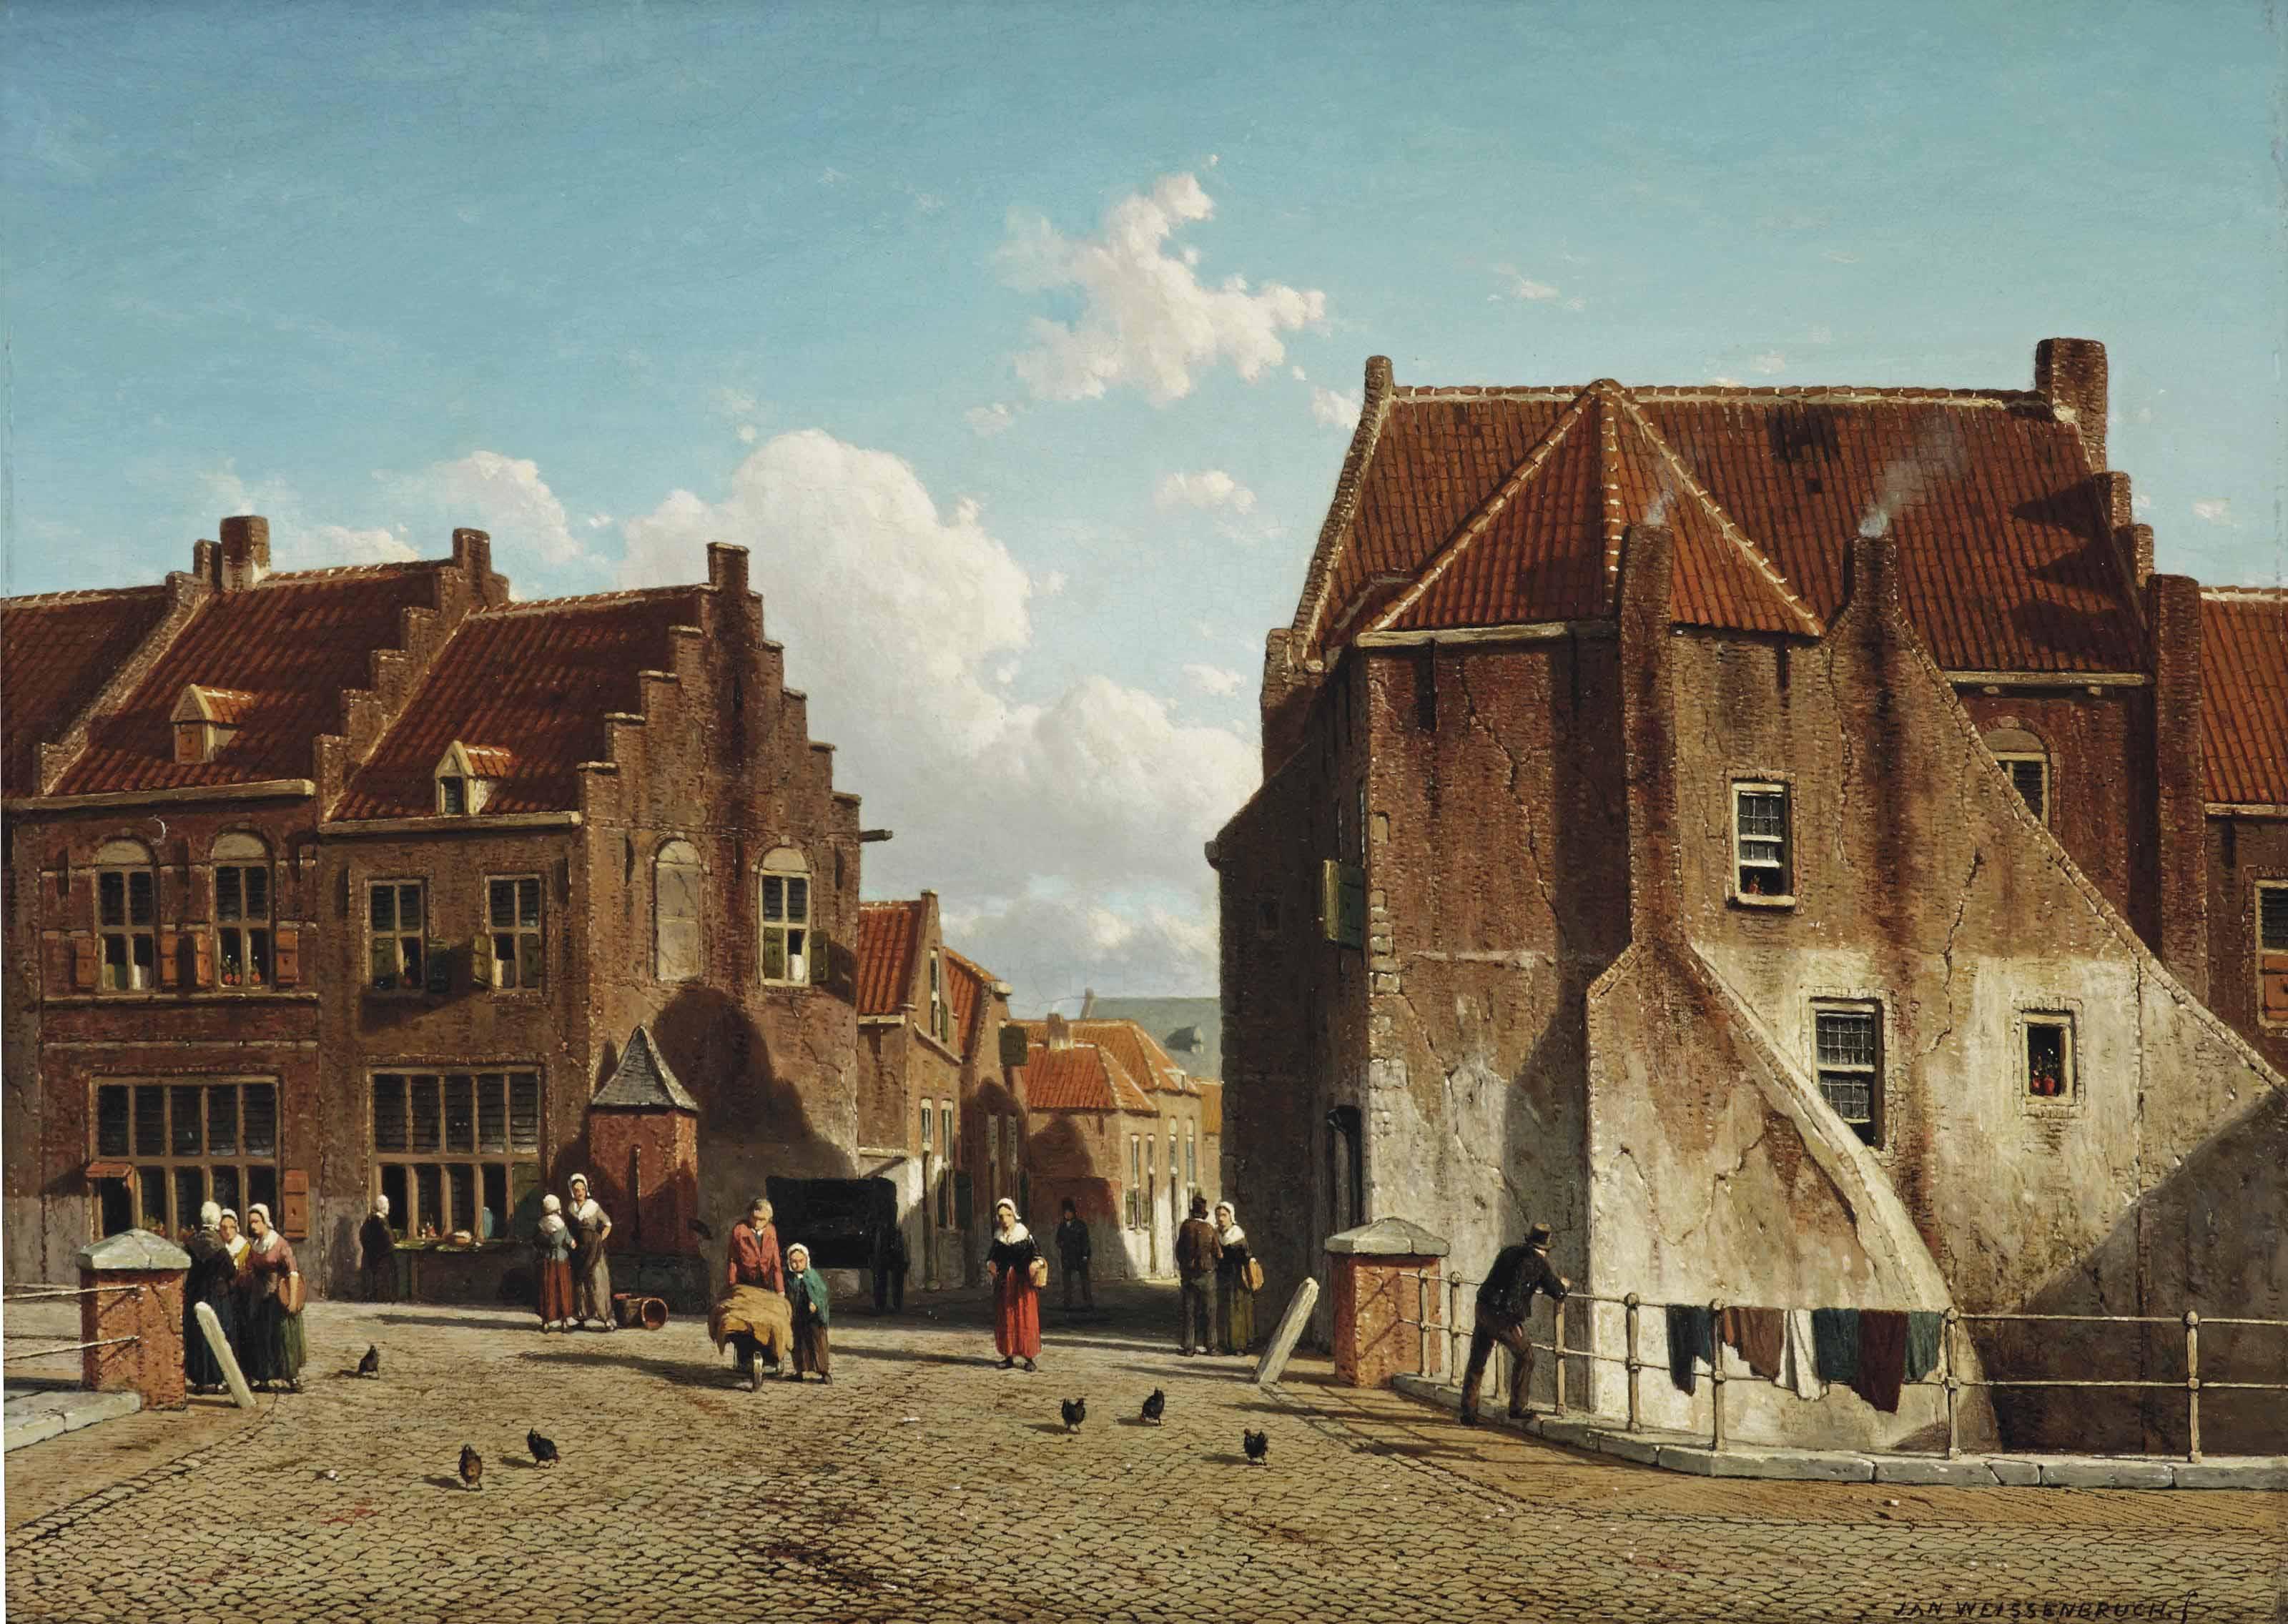 Kuilenburg: a market place with figures, Culemborg